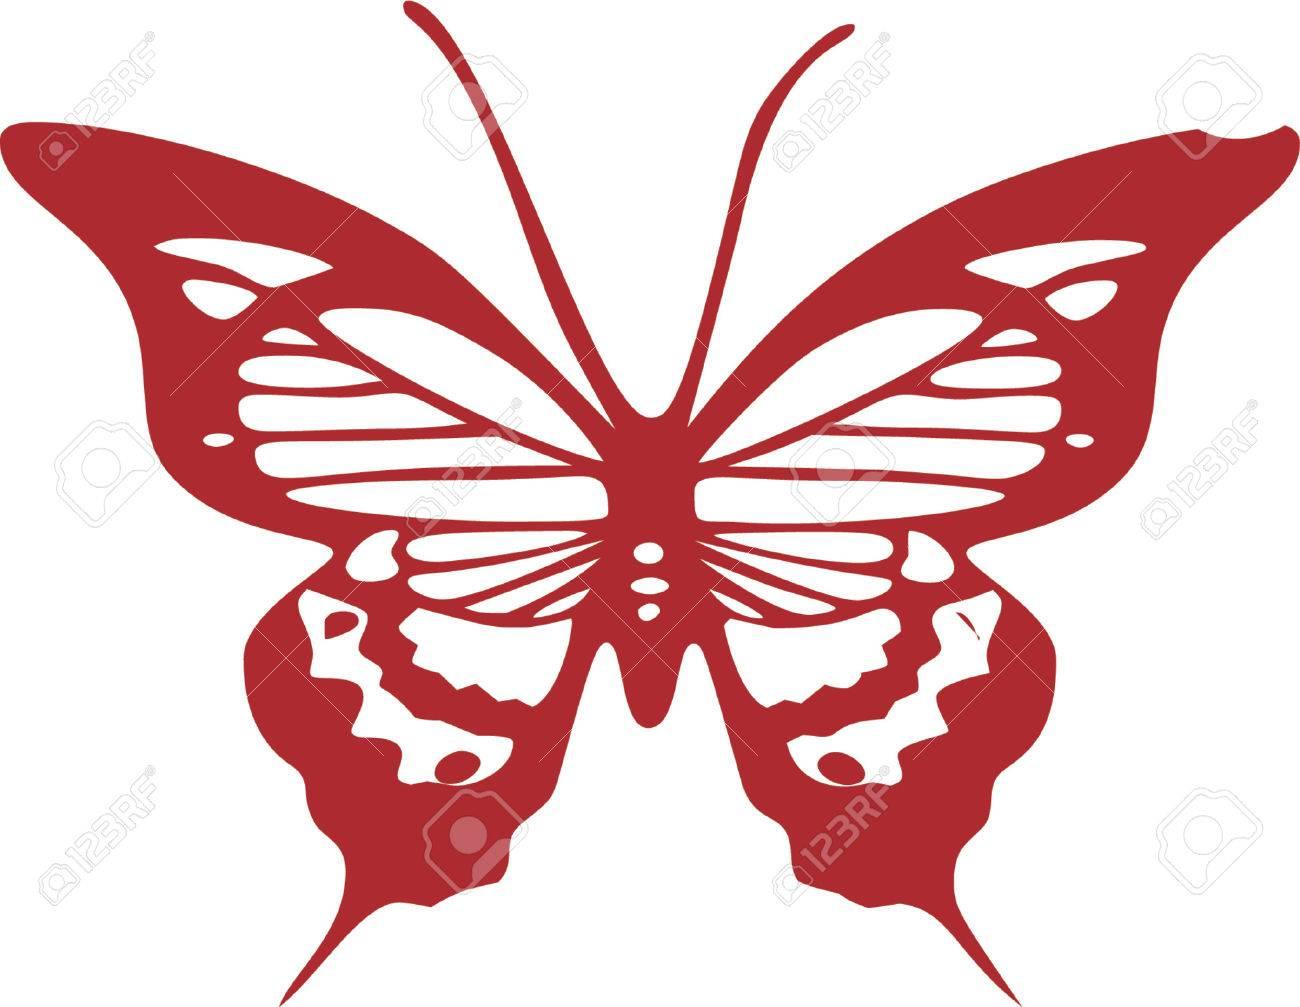 Butterfly clip art design illustration Stock Vector - 892475